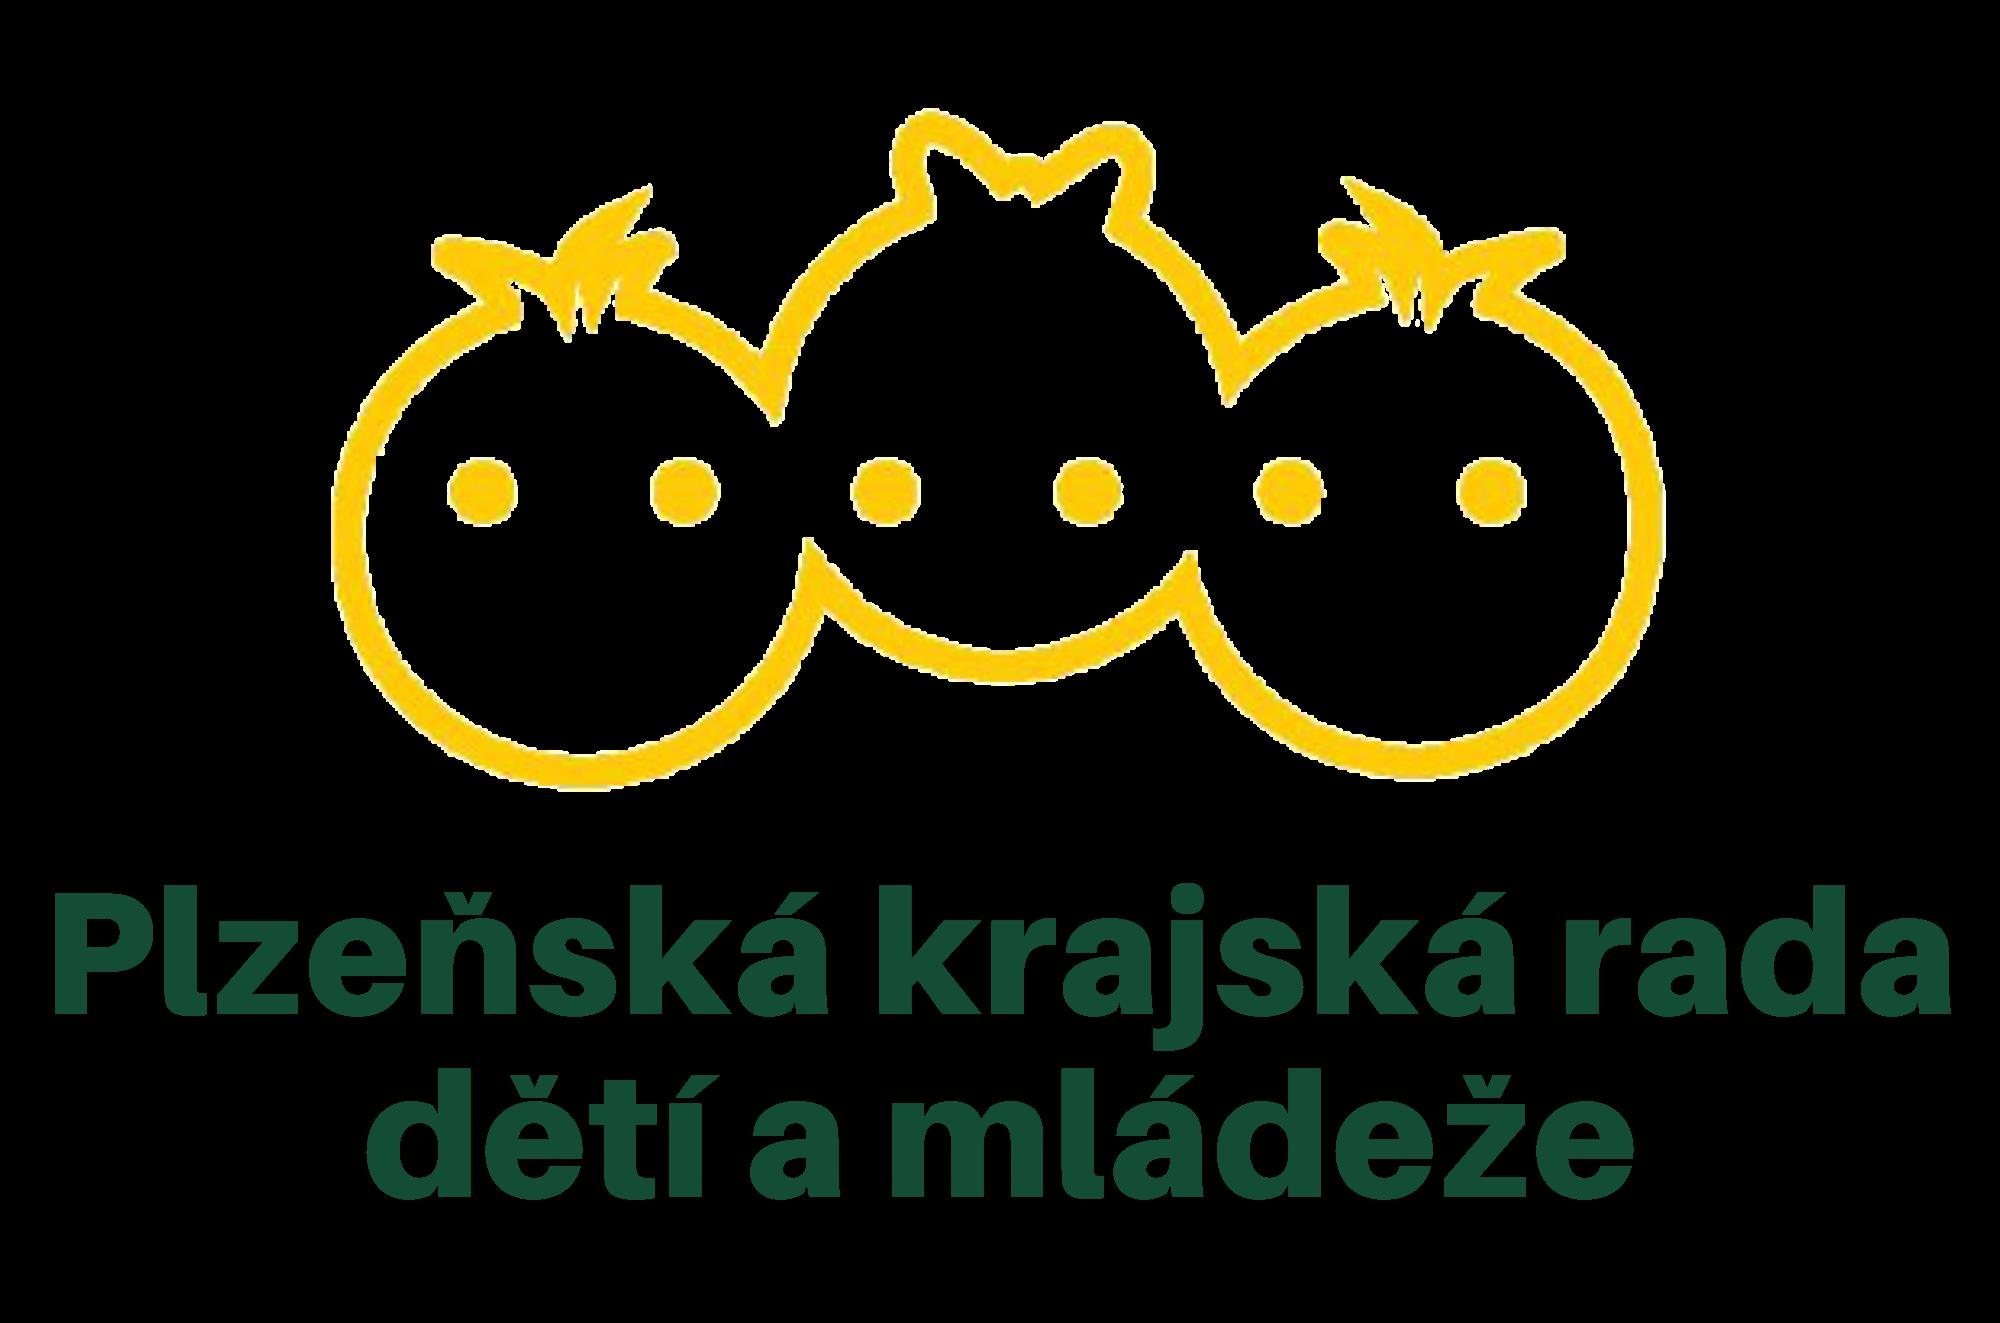 Skupovka a Plzeňská krajská rada dětí a mládeže